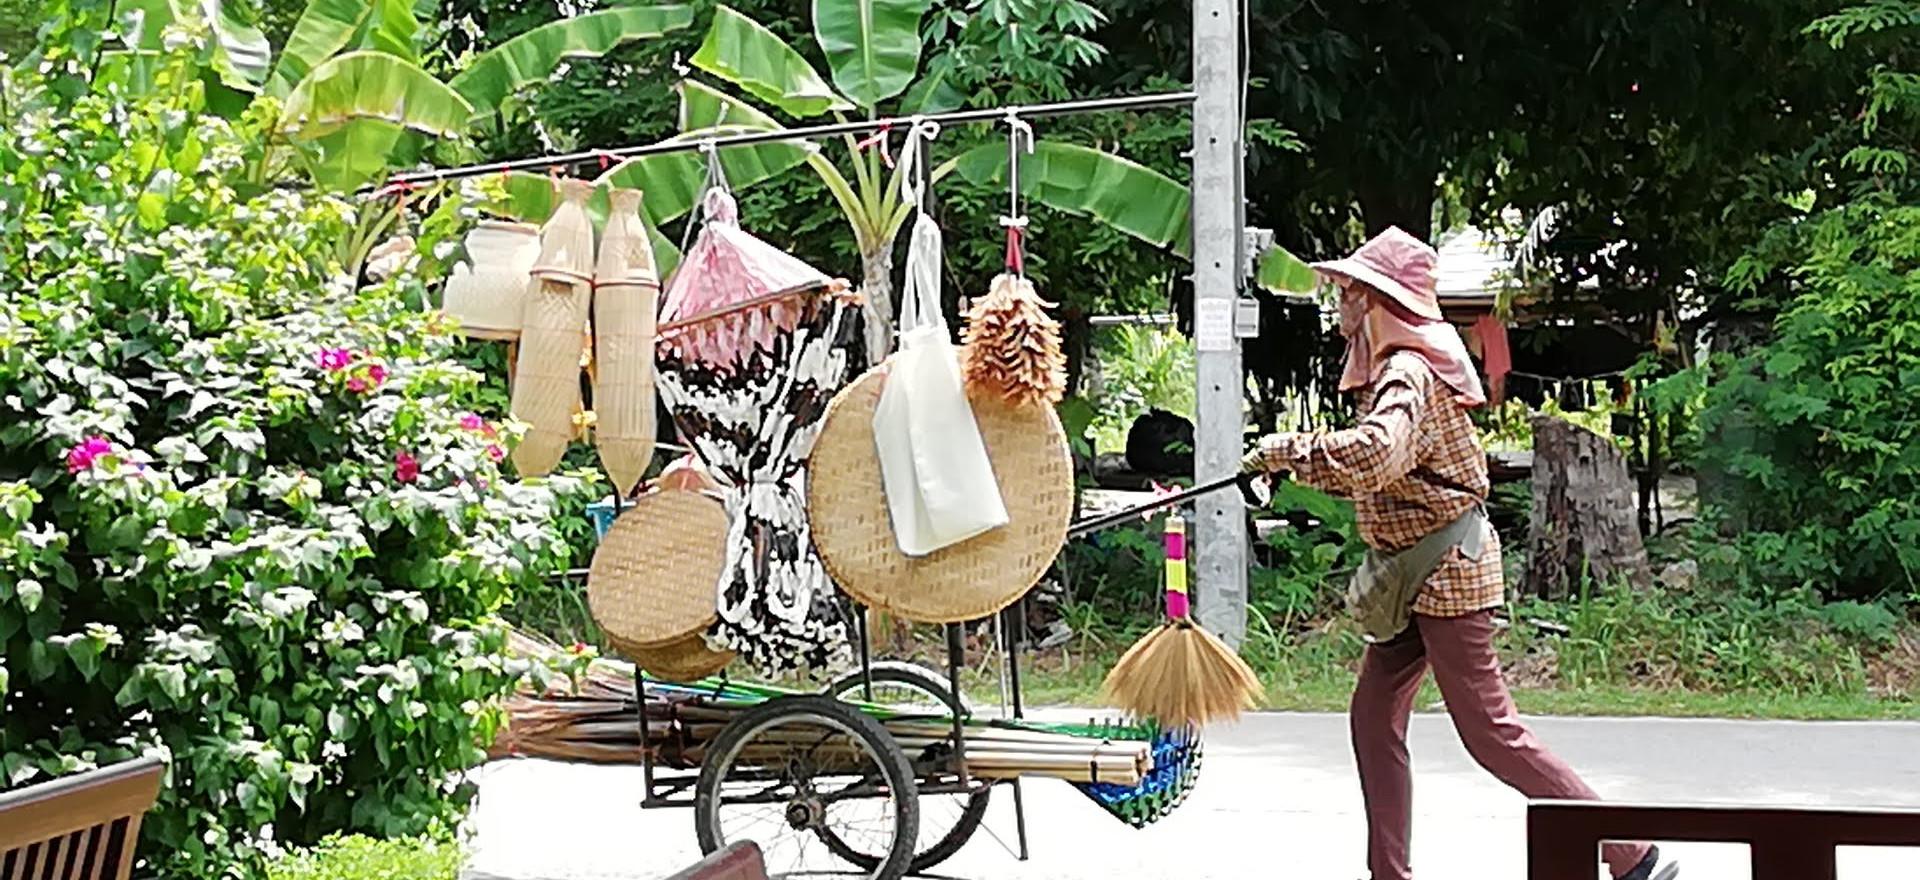 Local handmade baskets